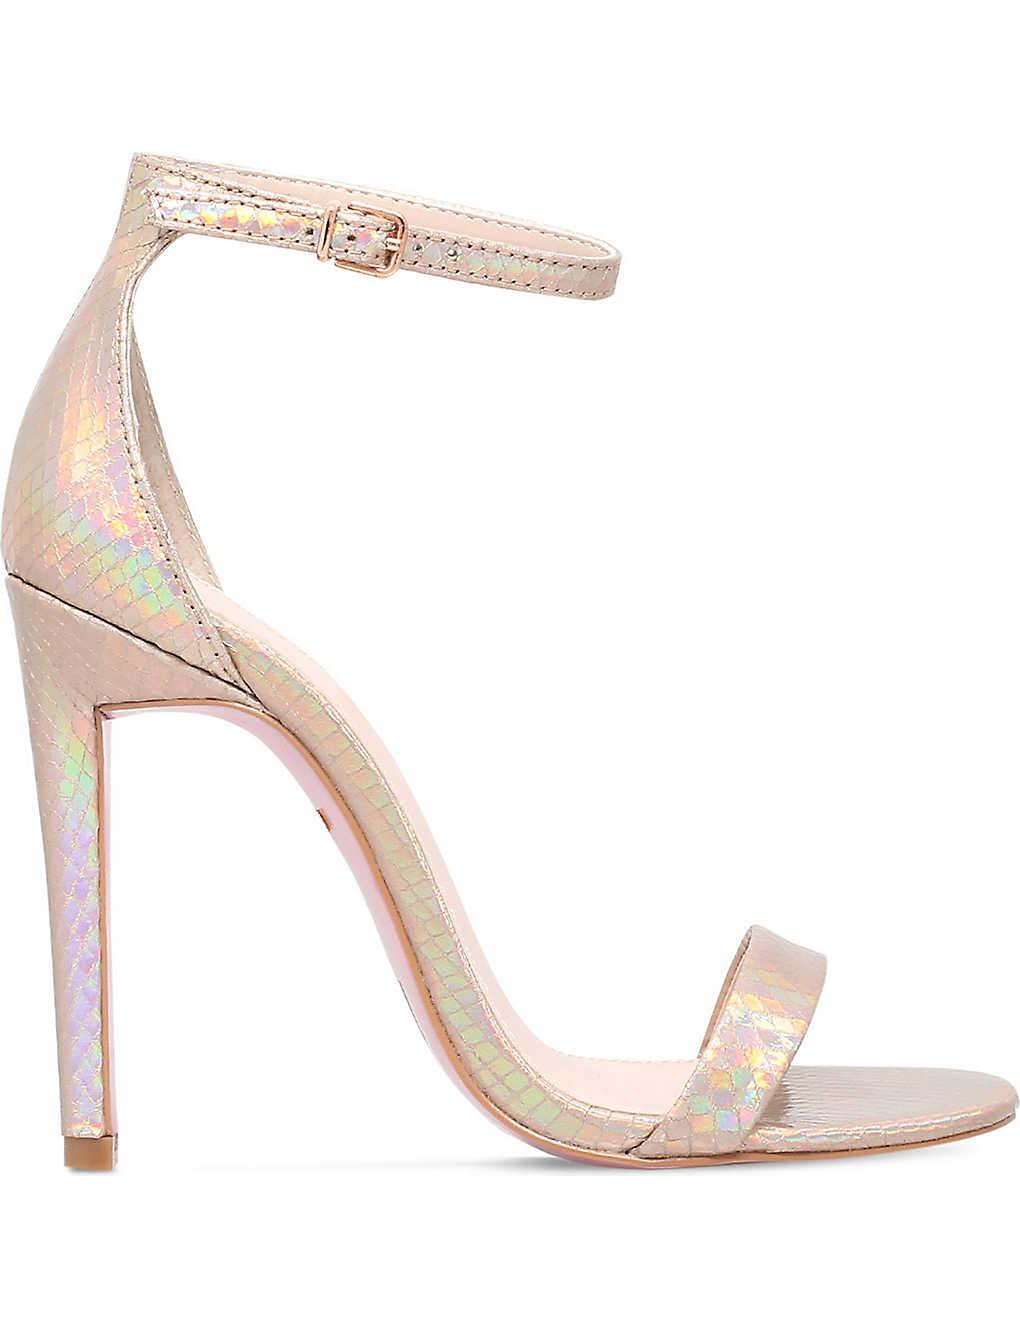 d32fd7005f CARVELA - Gatsby metallic heeled sandals | Selfridges.com